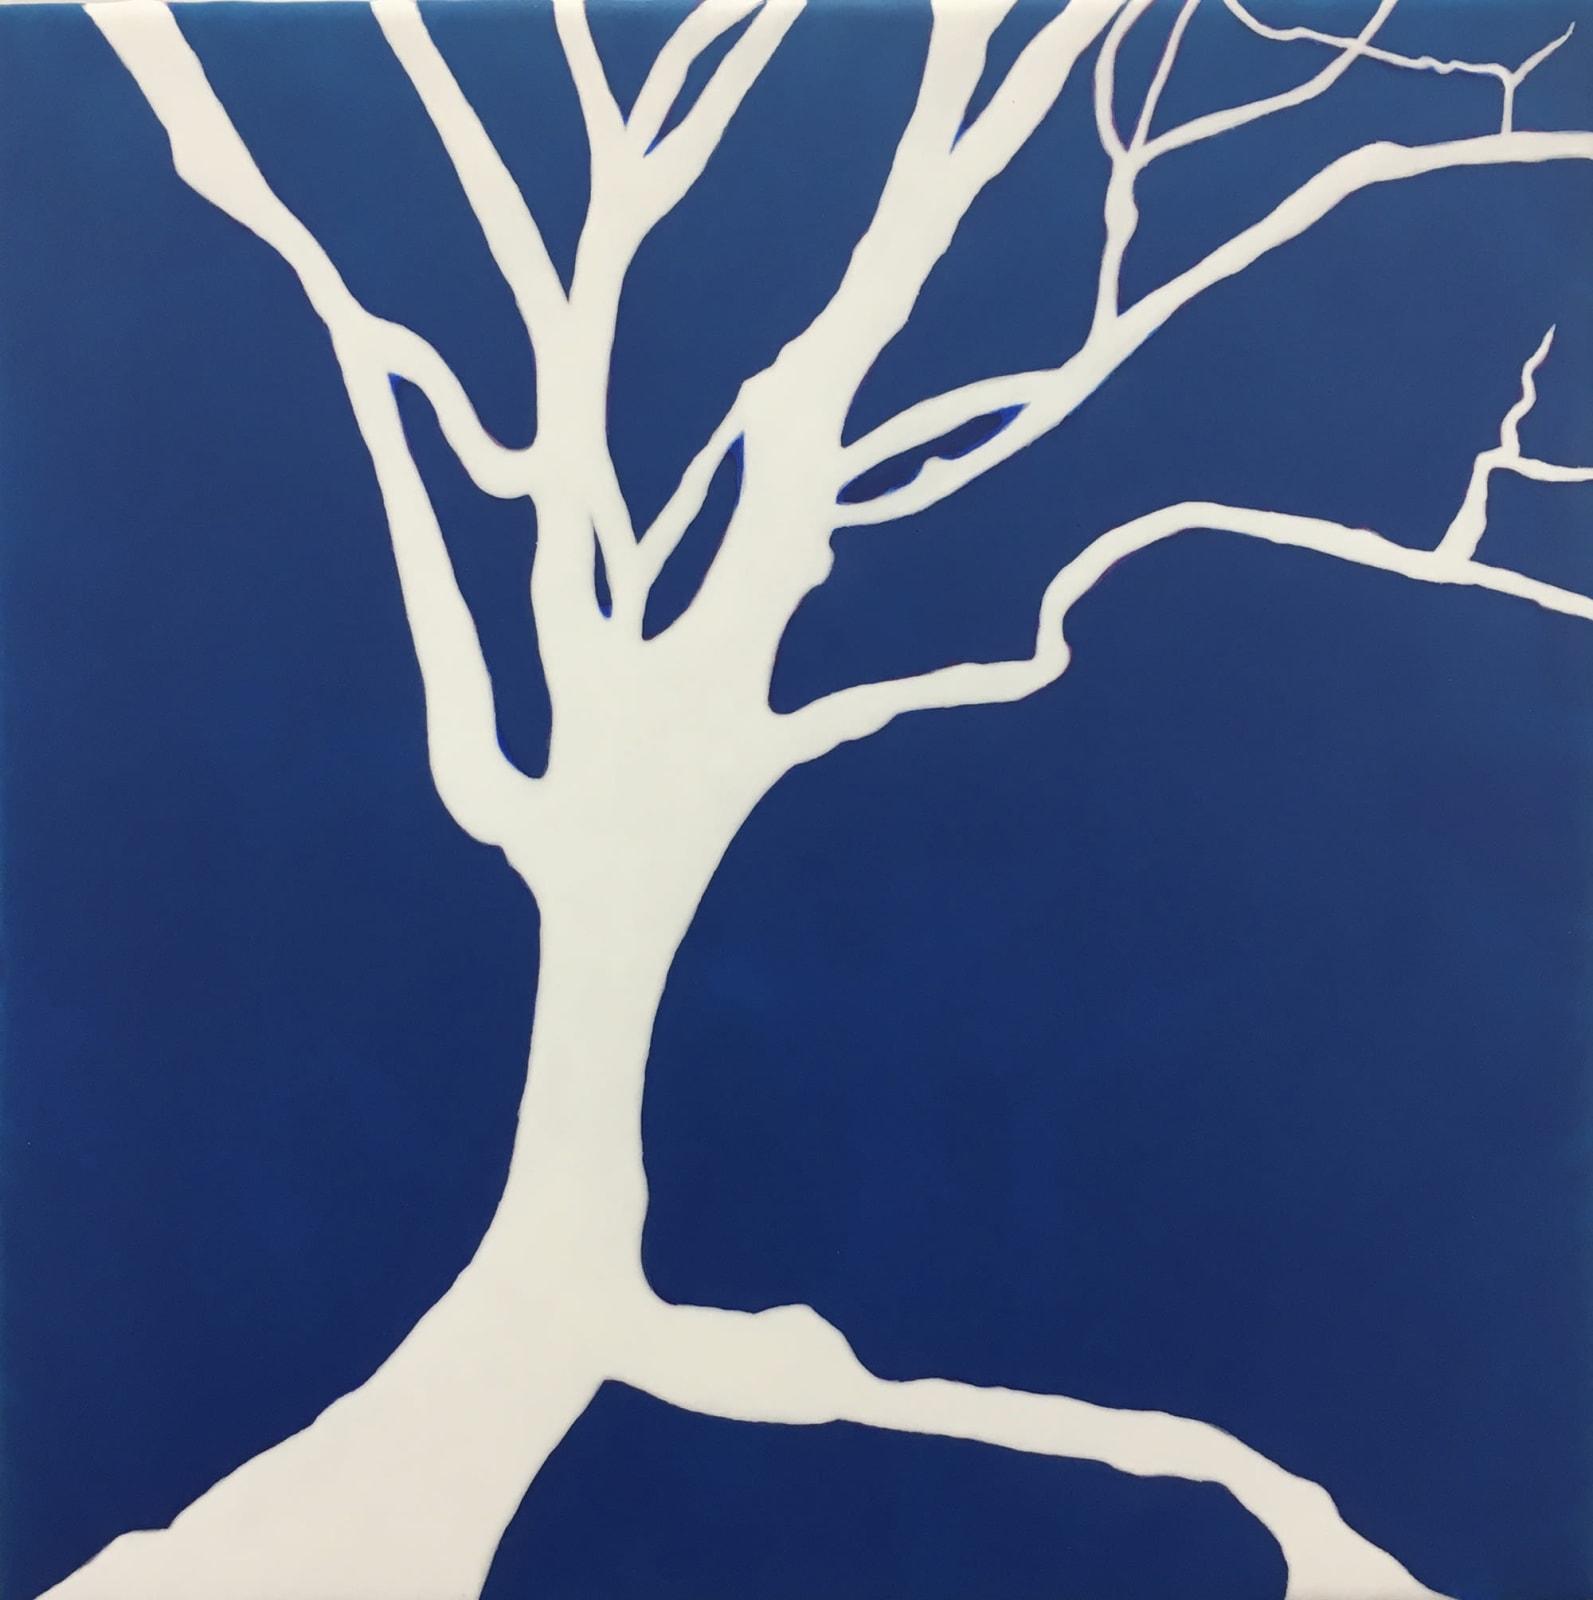 WINTER DOGWOOD, 2019 Acrylic on linen mounted on wood panel 12 x 12 in. 30.5 x 30.5 cm HS 61